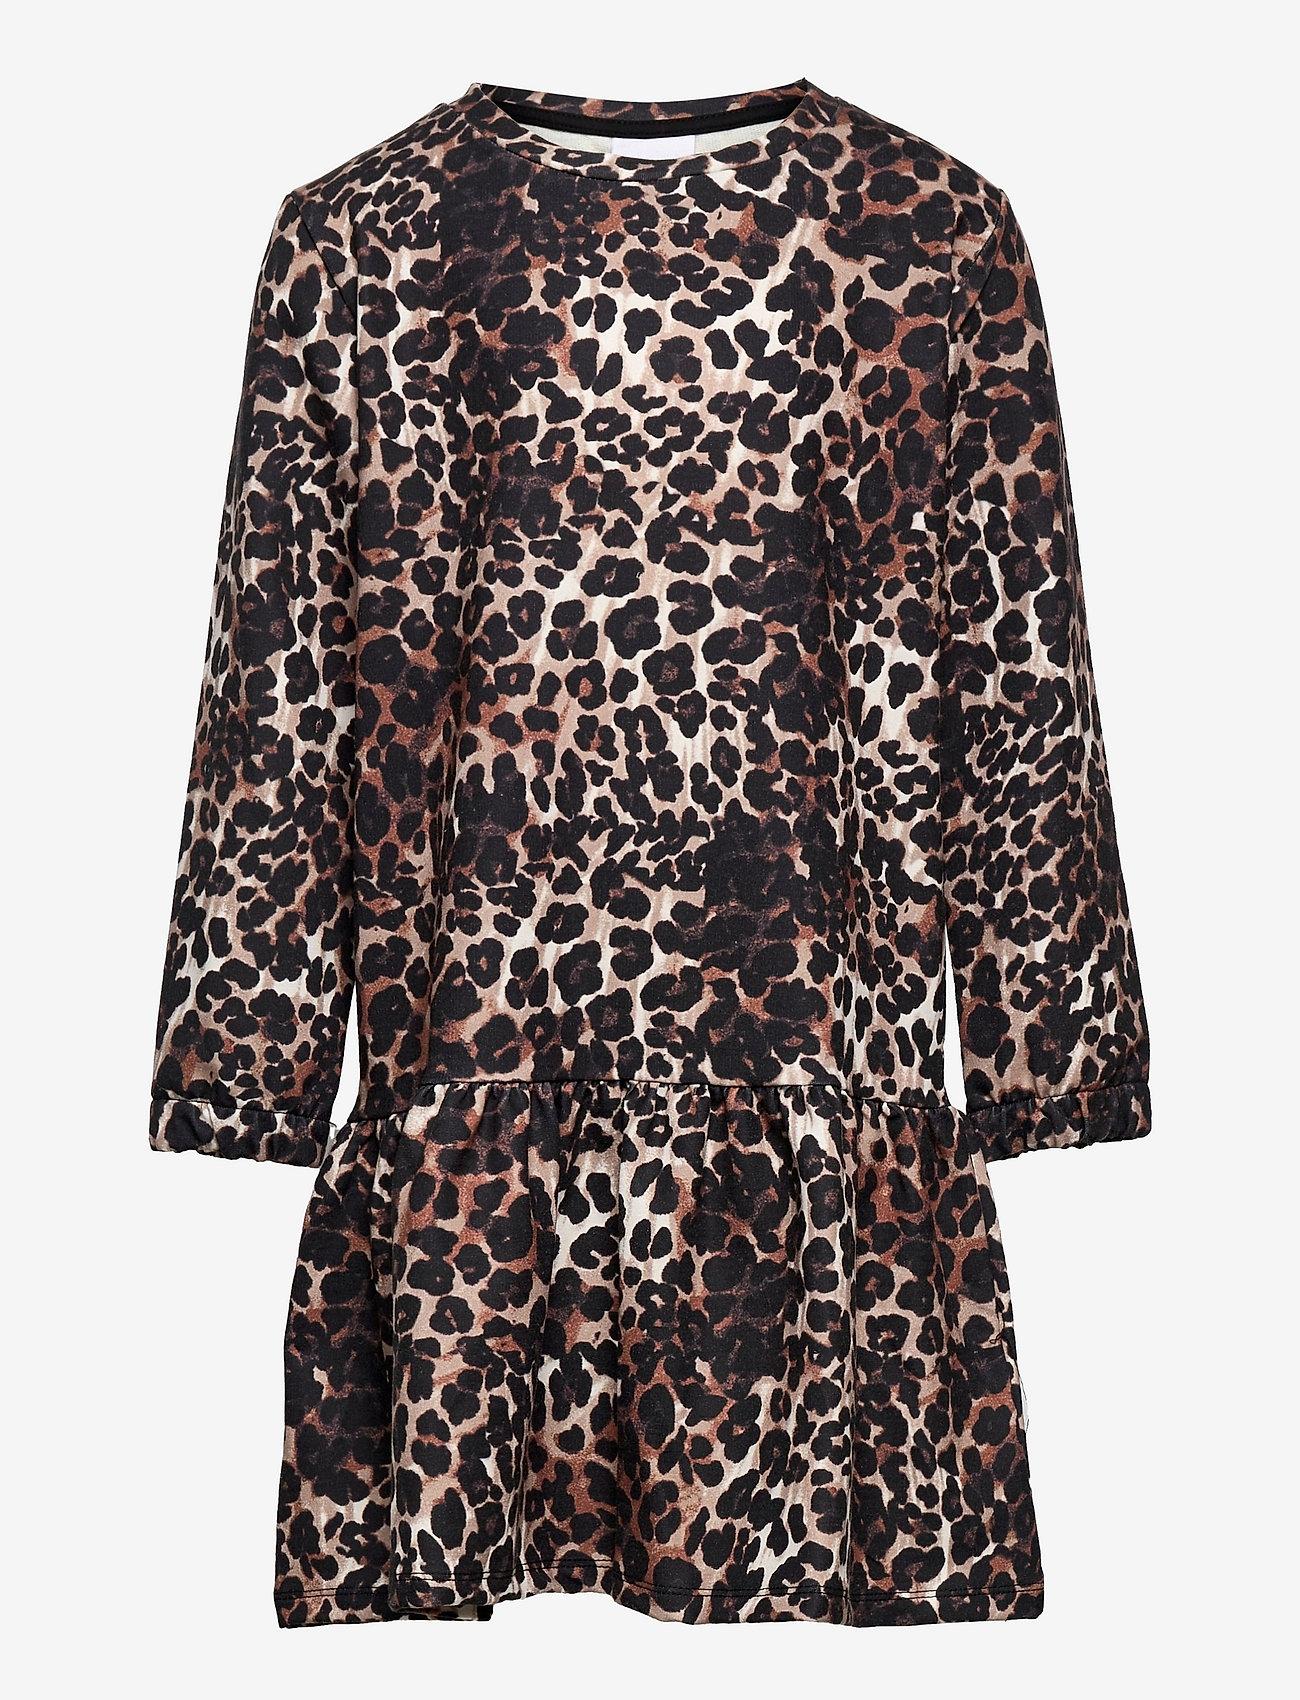 The New - PALEO SWEAT DRESS - kleider - brown leo - 0